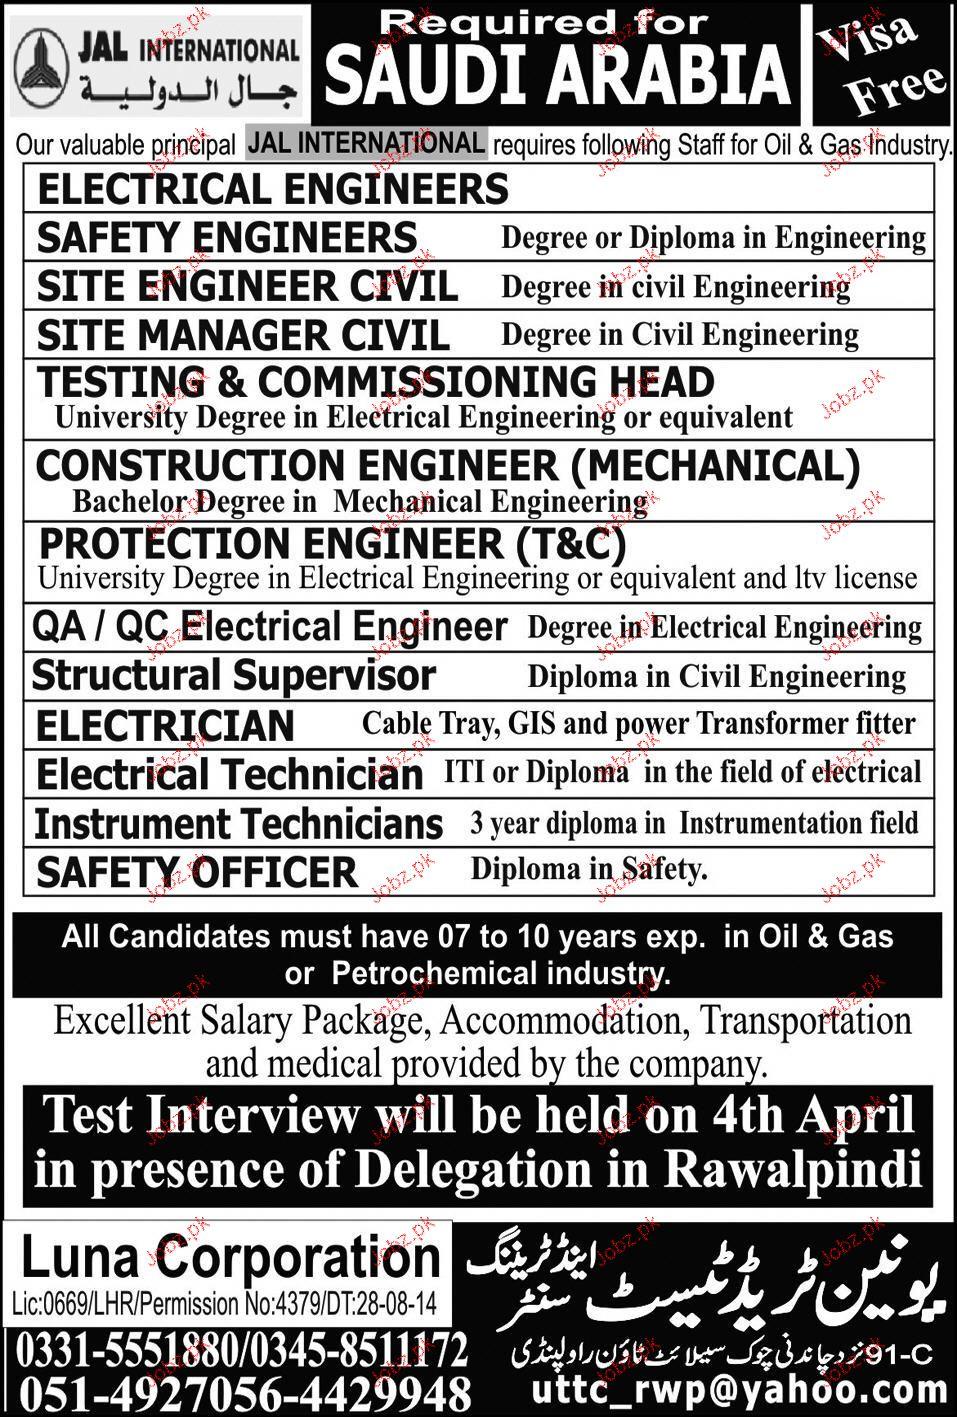 Electrical Engineers, Site Engineer Civil Job Opportunity